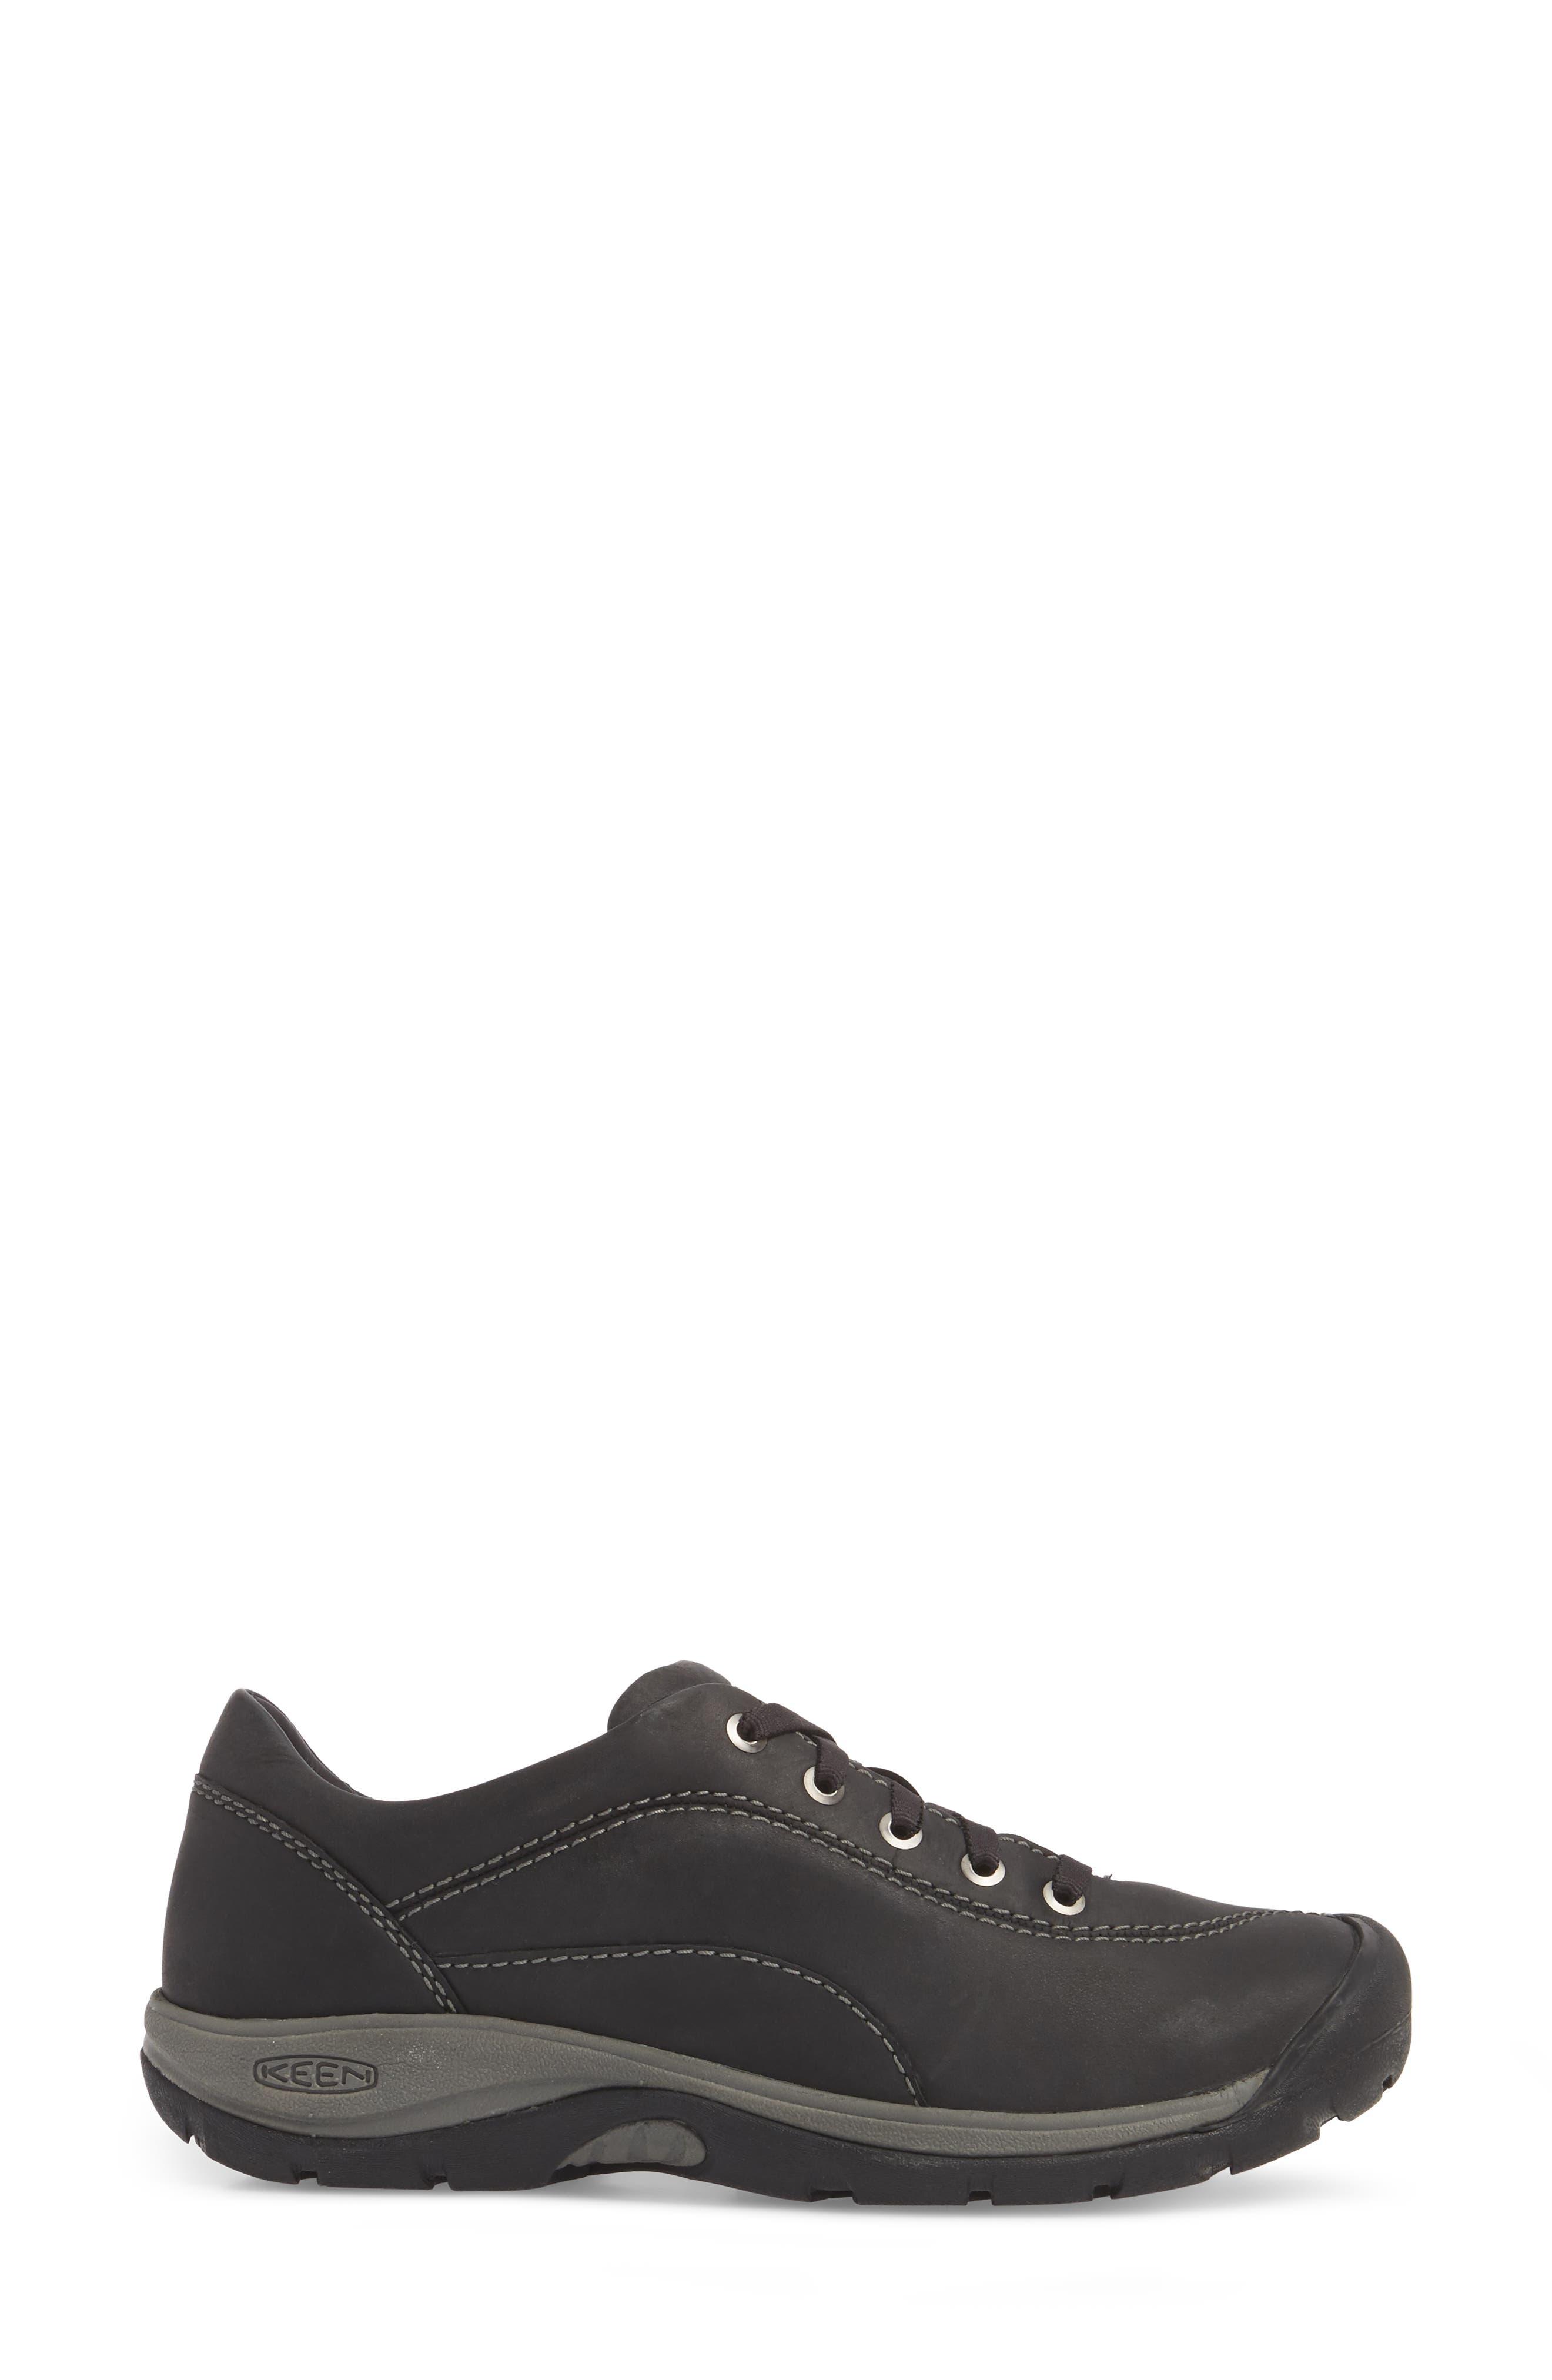 Presidio II Sneaker,                             Alternate thumbnail 3, color,                             BLACK/ STEEL GREY LEATHER